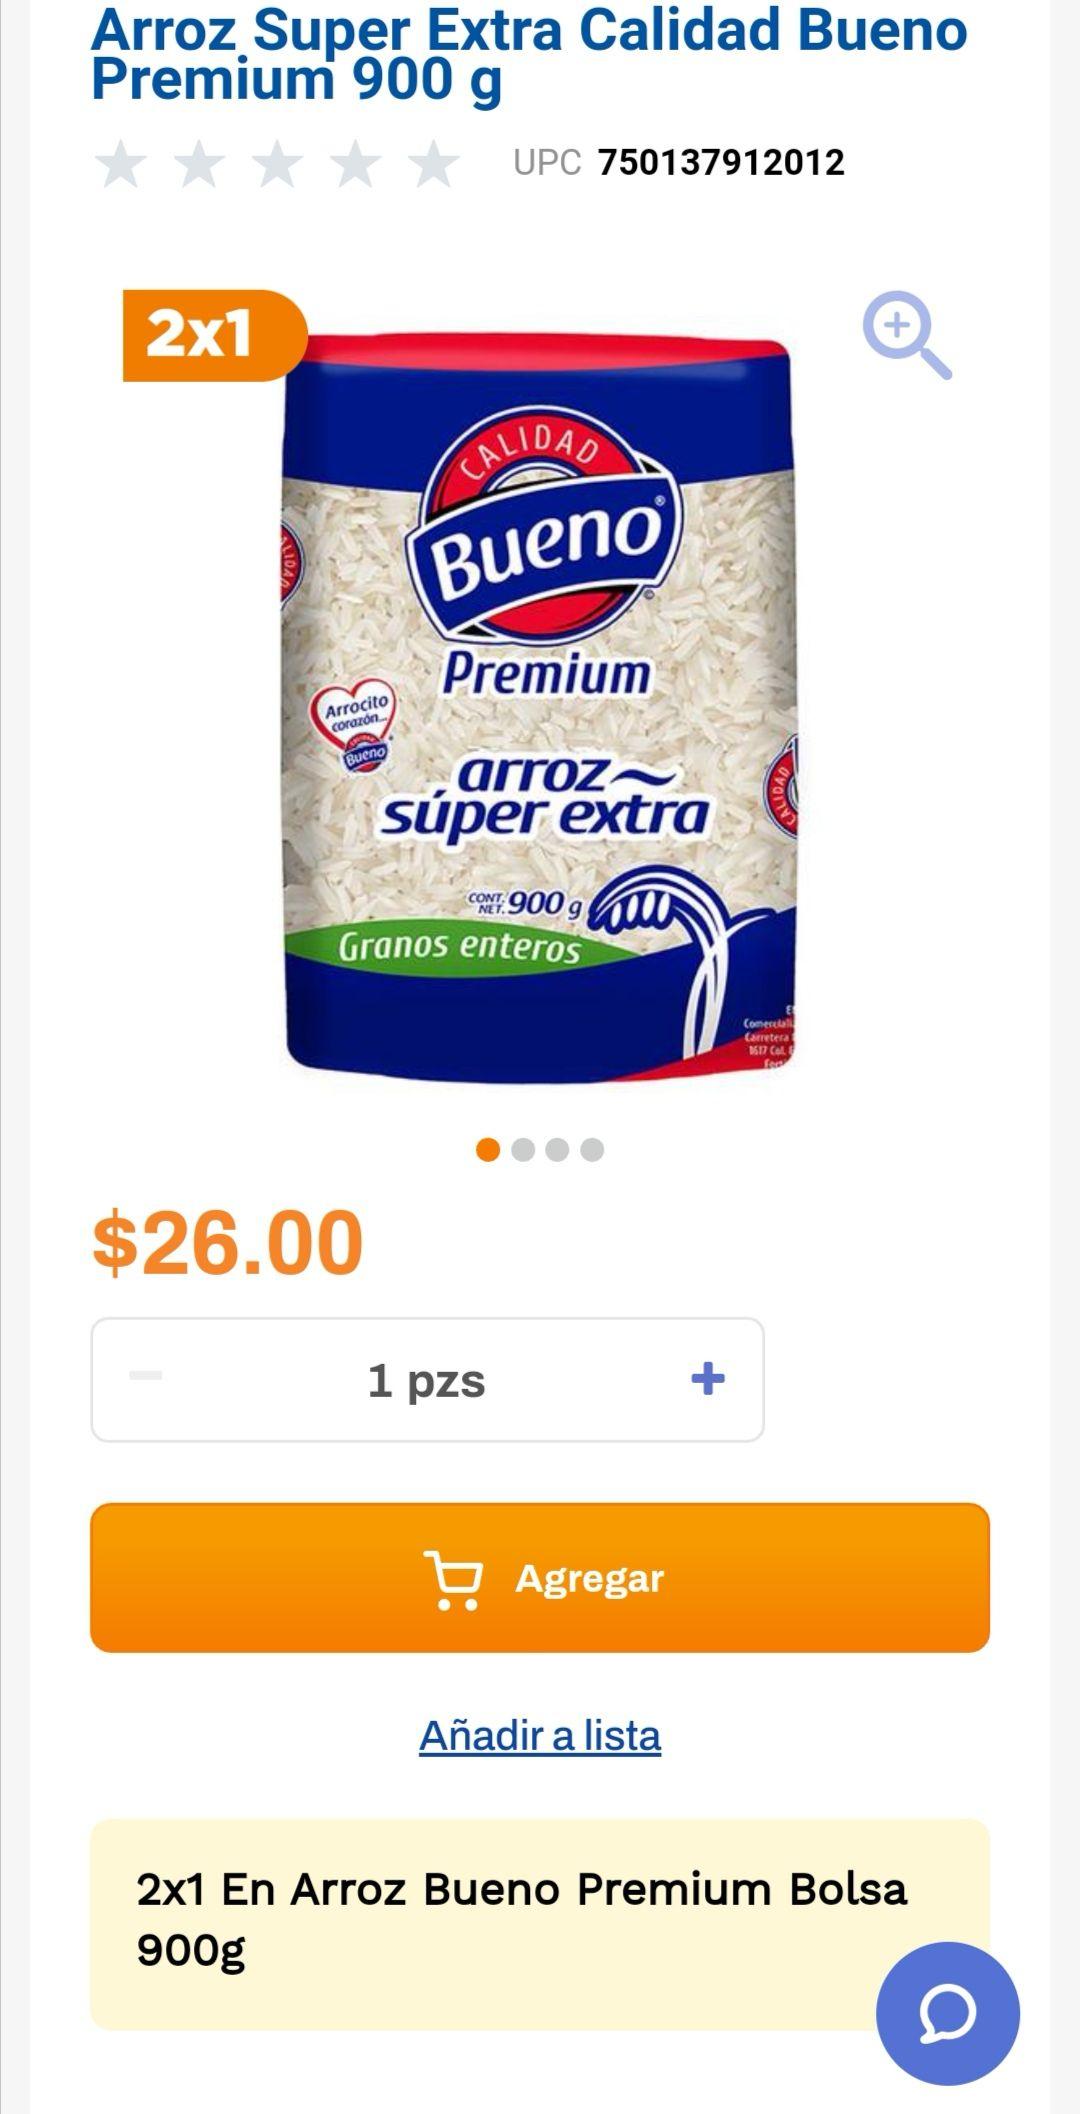 Chedraui: 2 x 1 en arroz Bueno Premium bolsa 900 g.